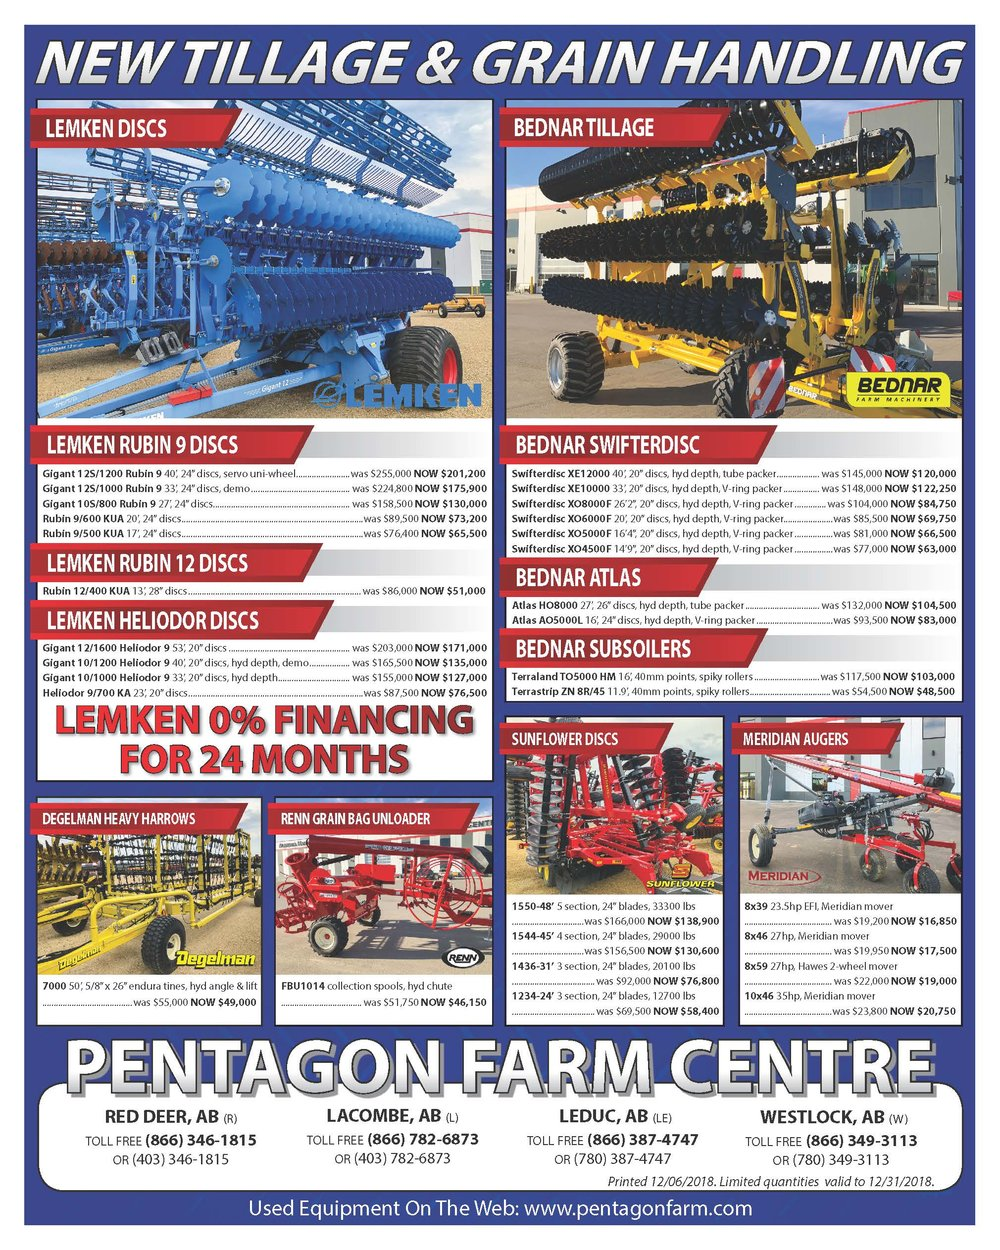 Tillage and Grain Handling (12-06-2018).jpg